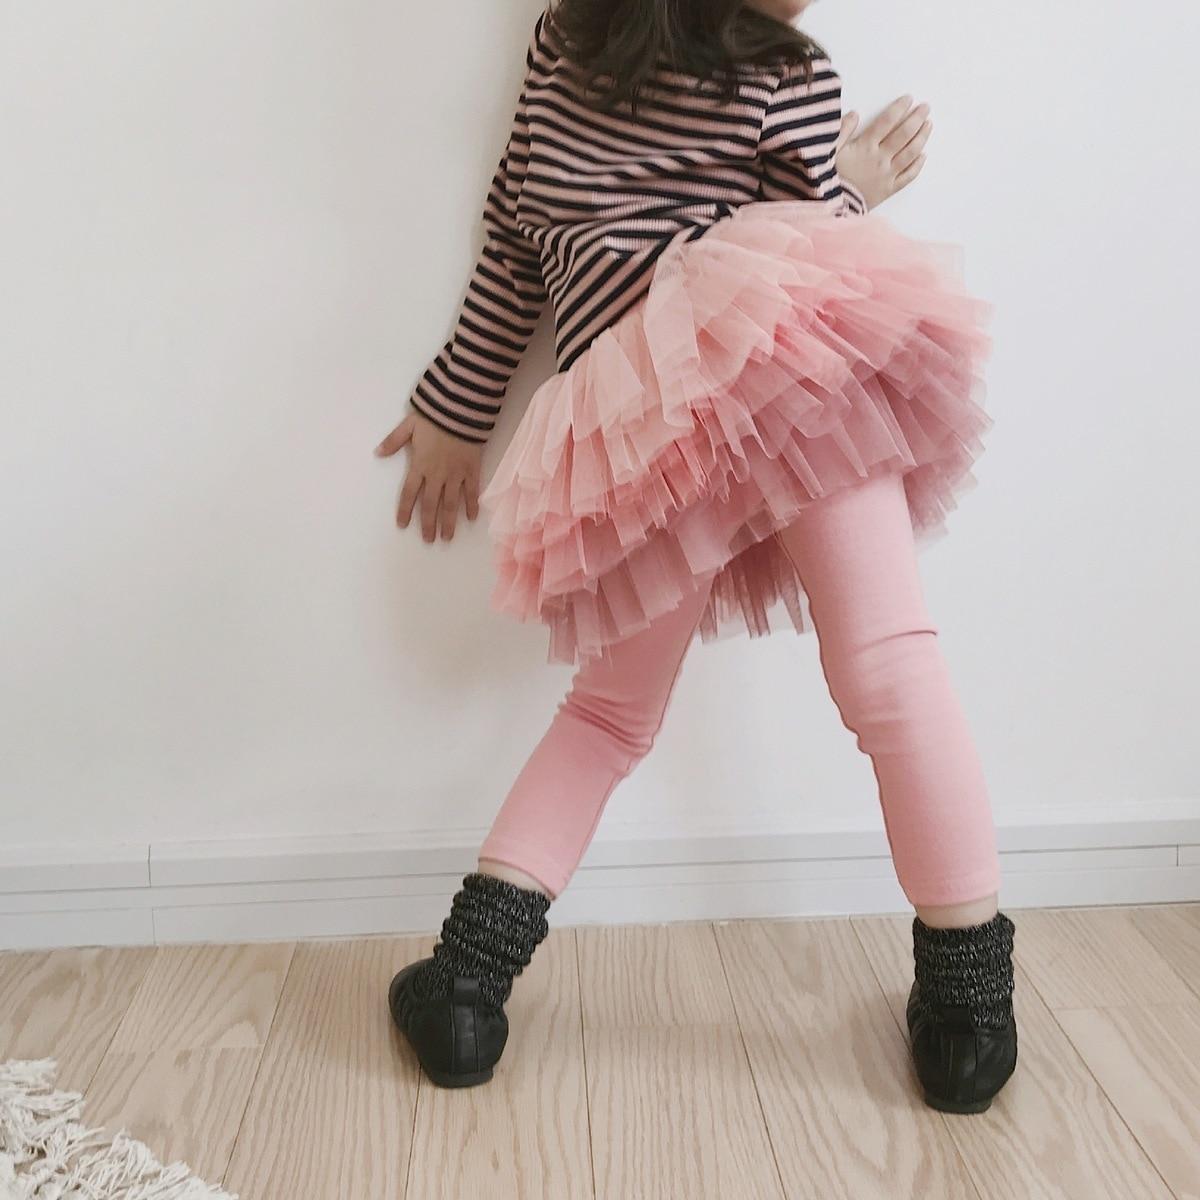 Girls Leggings 2019 Cotton Culottes Tutu Skirt For Girl Baby Girl Shining Lace Leggings Spring Autumn Kids Pants Trousers girl